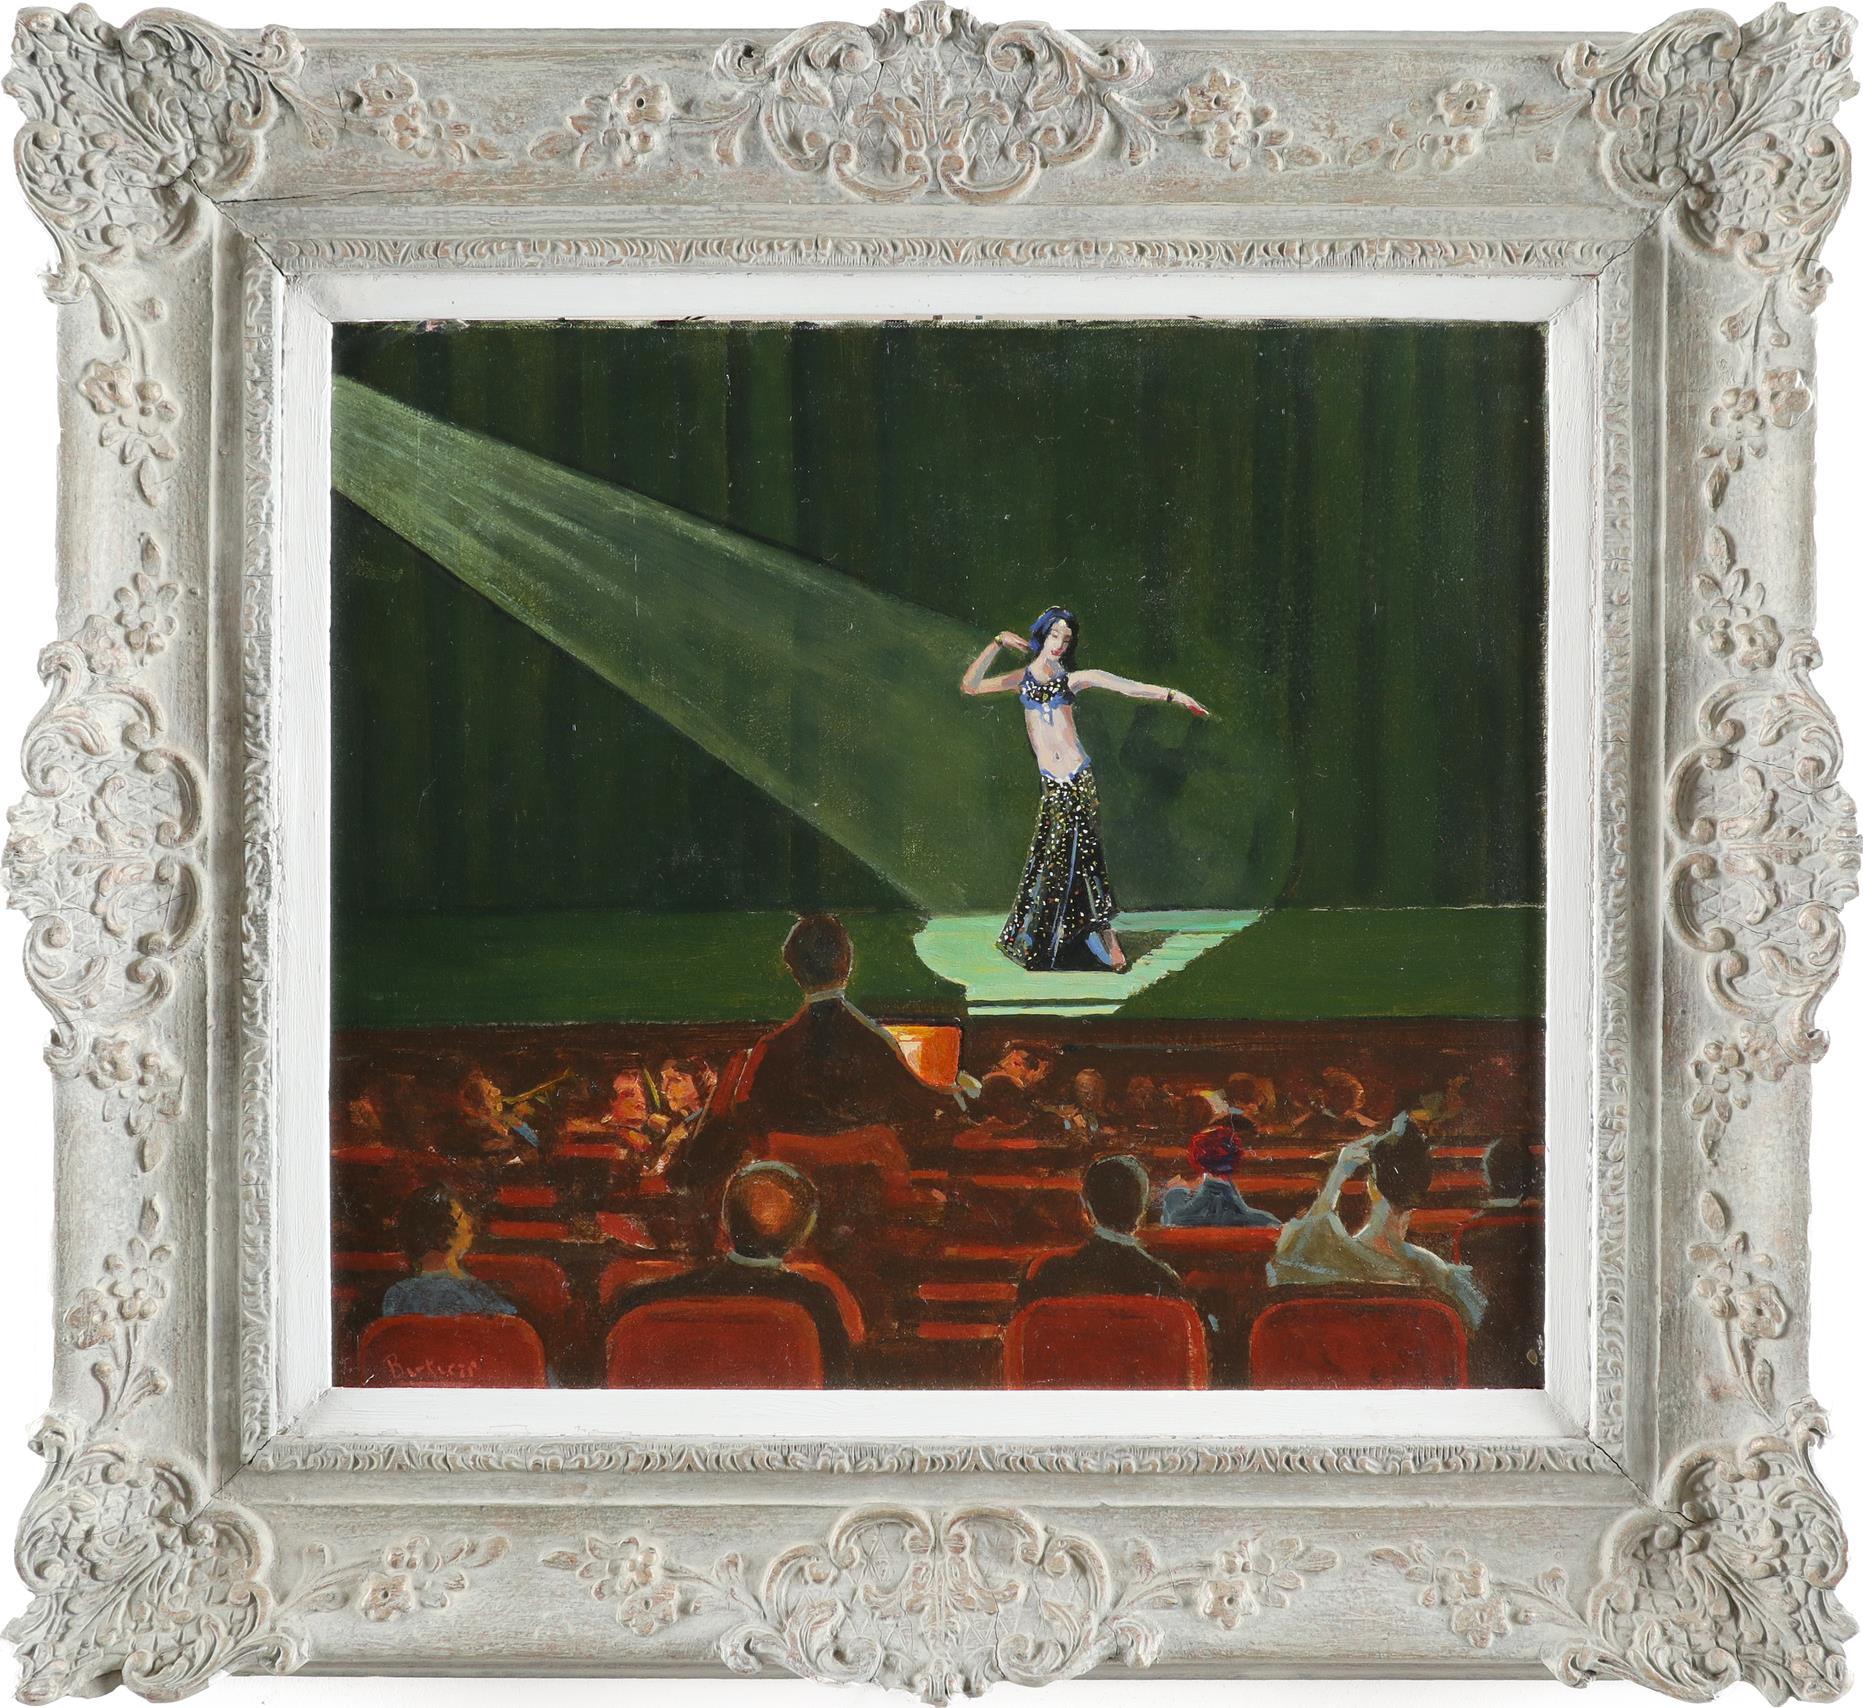 ‡Pilade Bertieri (Italian 1874-1965) Dancer in the spotlight Signed Bertieri (lower left) Oil on - Image 2 of 3